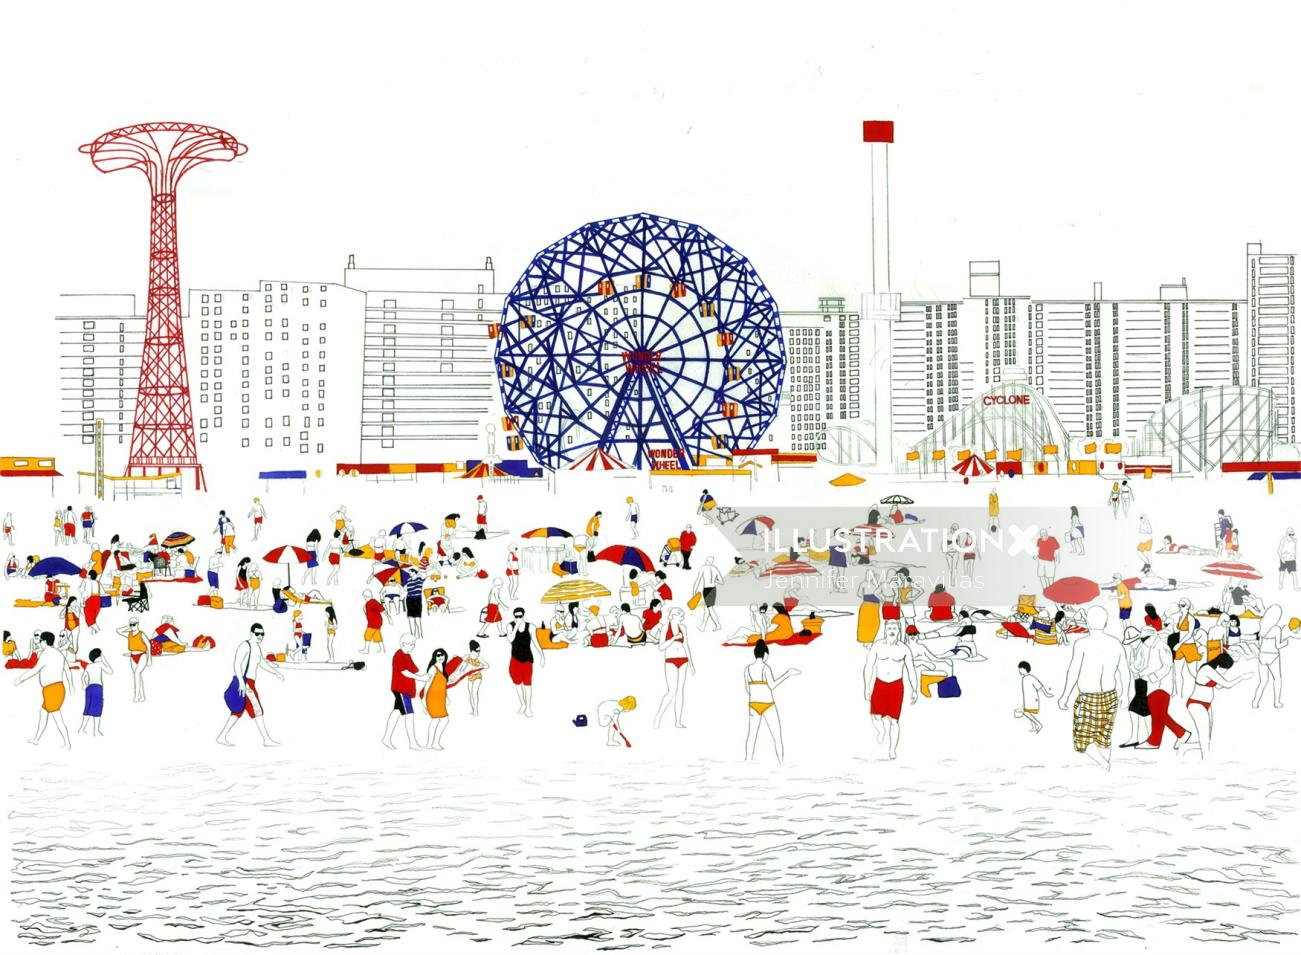 Coney Island illustration by Jennifer Maravillas